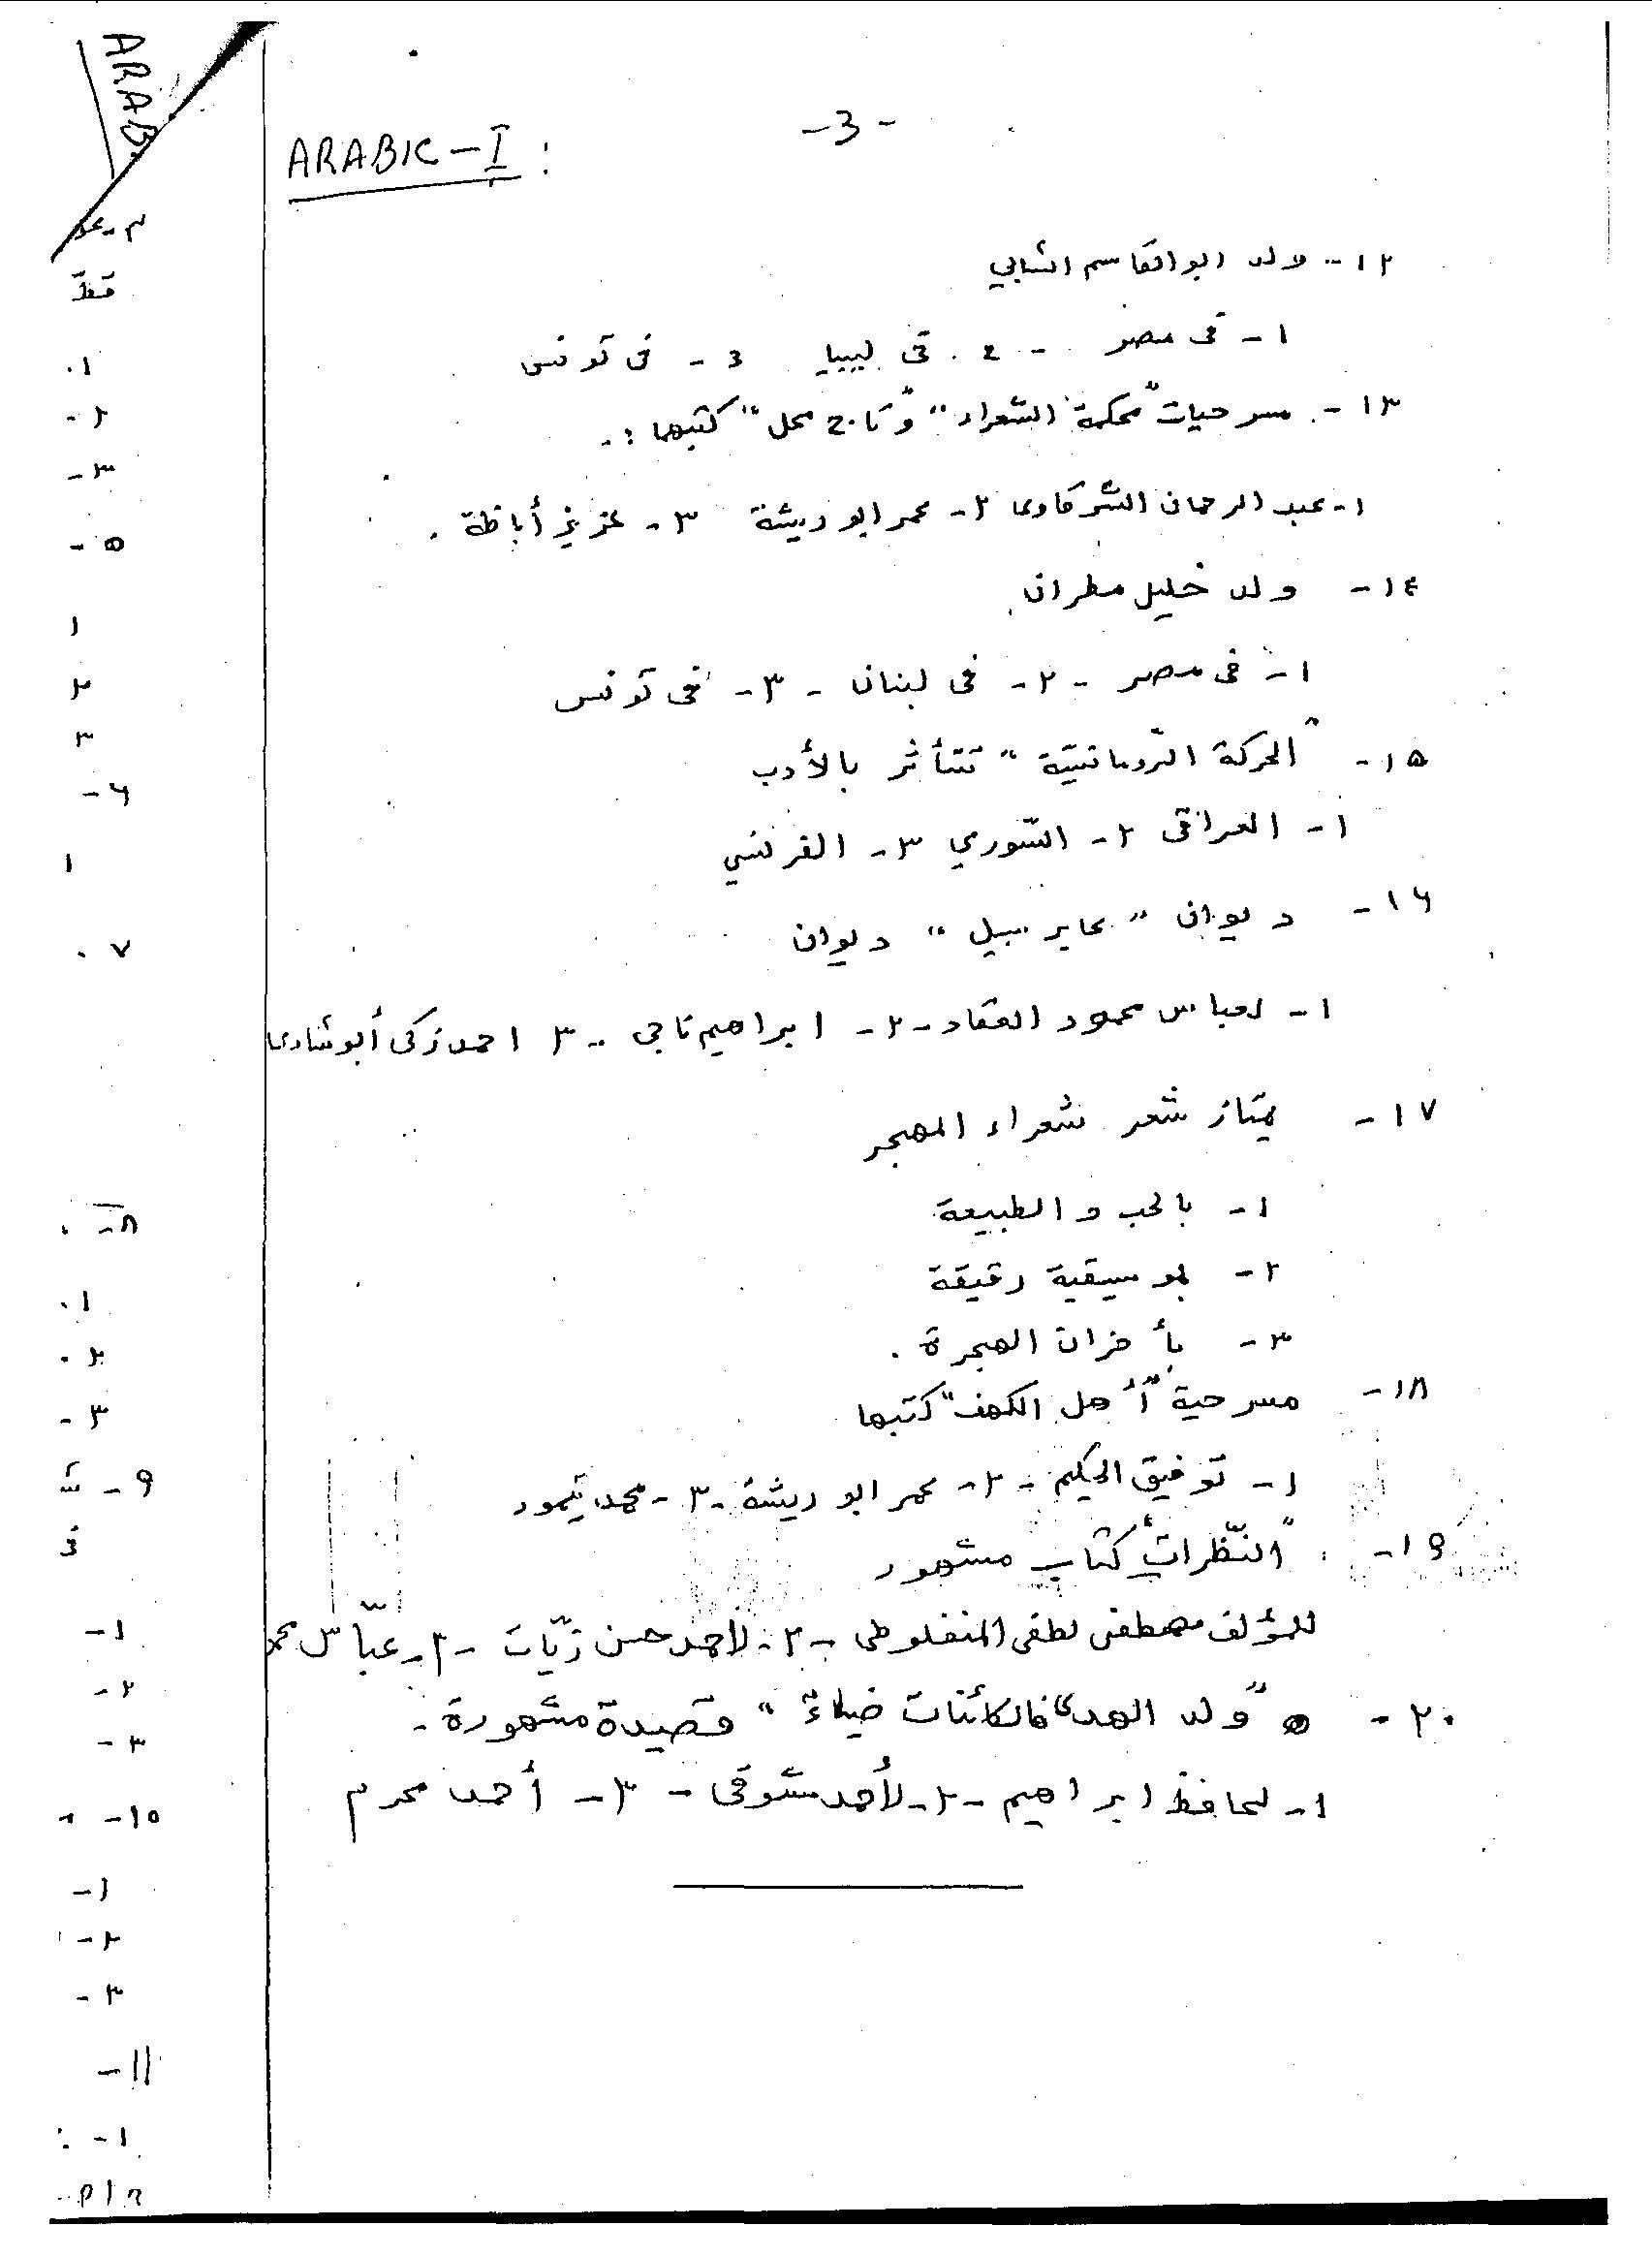 2011 Mathematics Paper 1